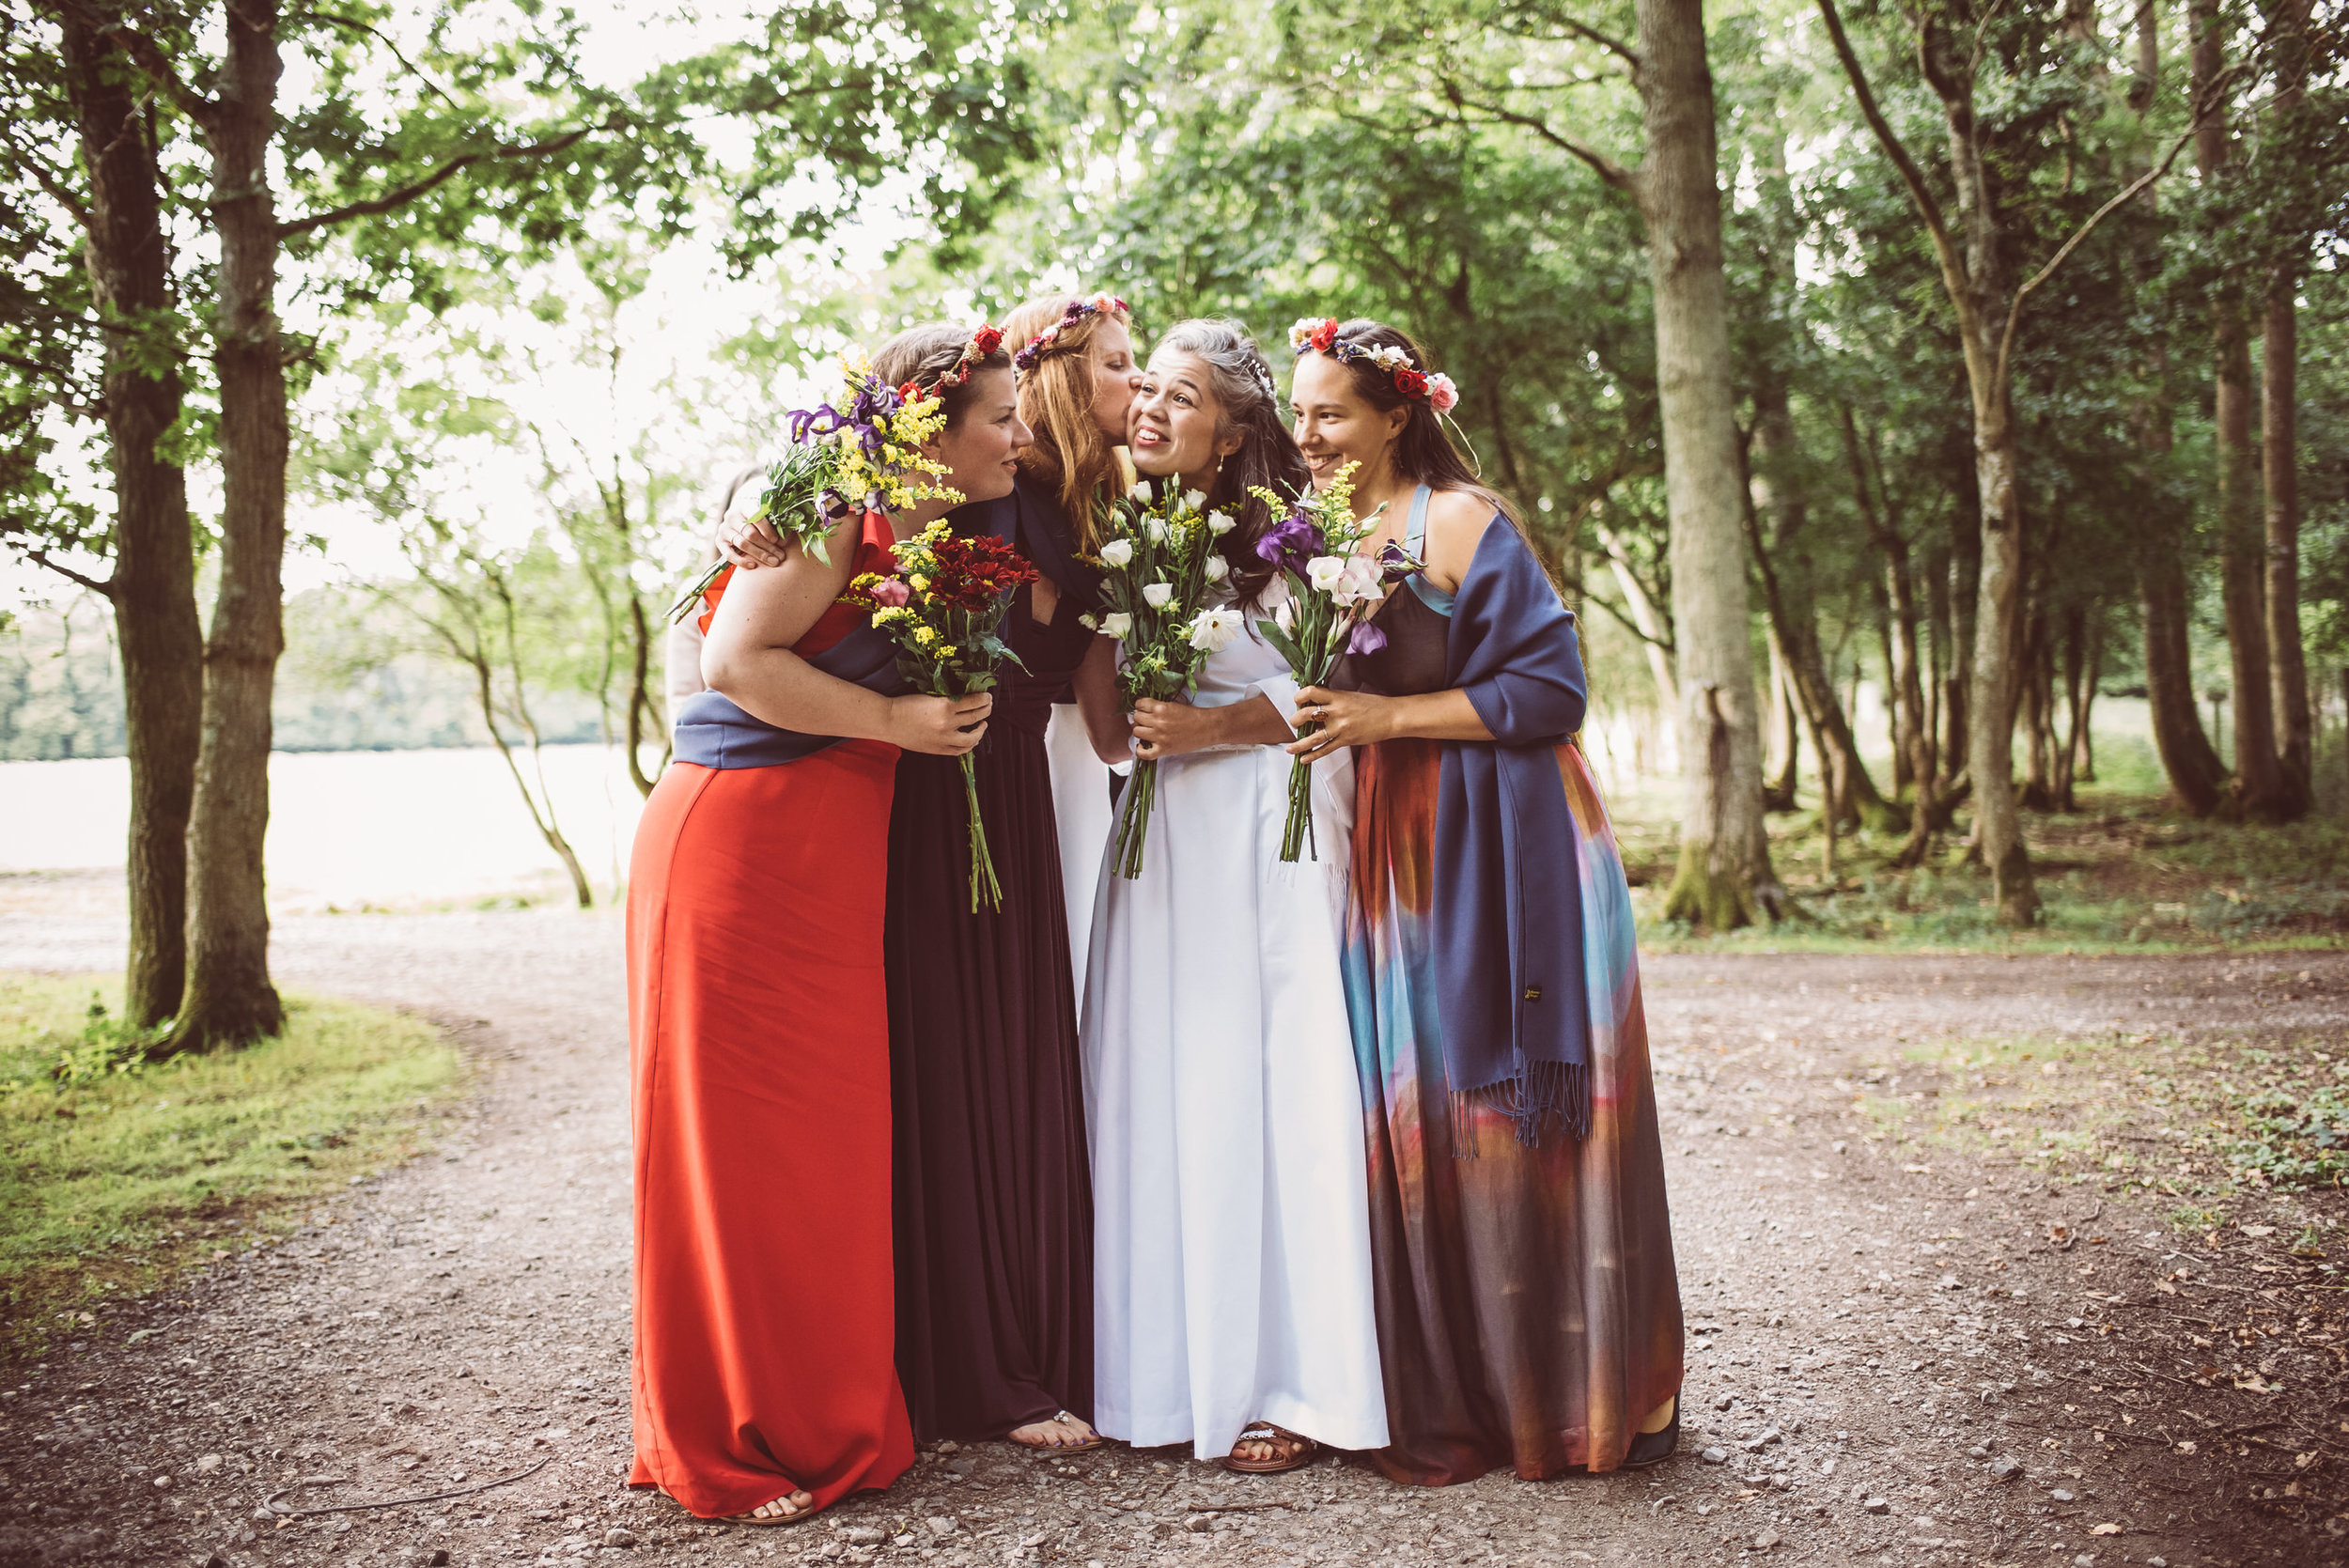 knepp-castle-boho-outdoor-wedding-125.jpg